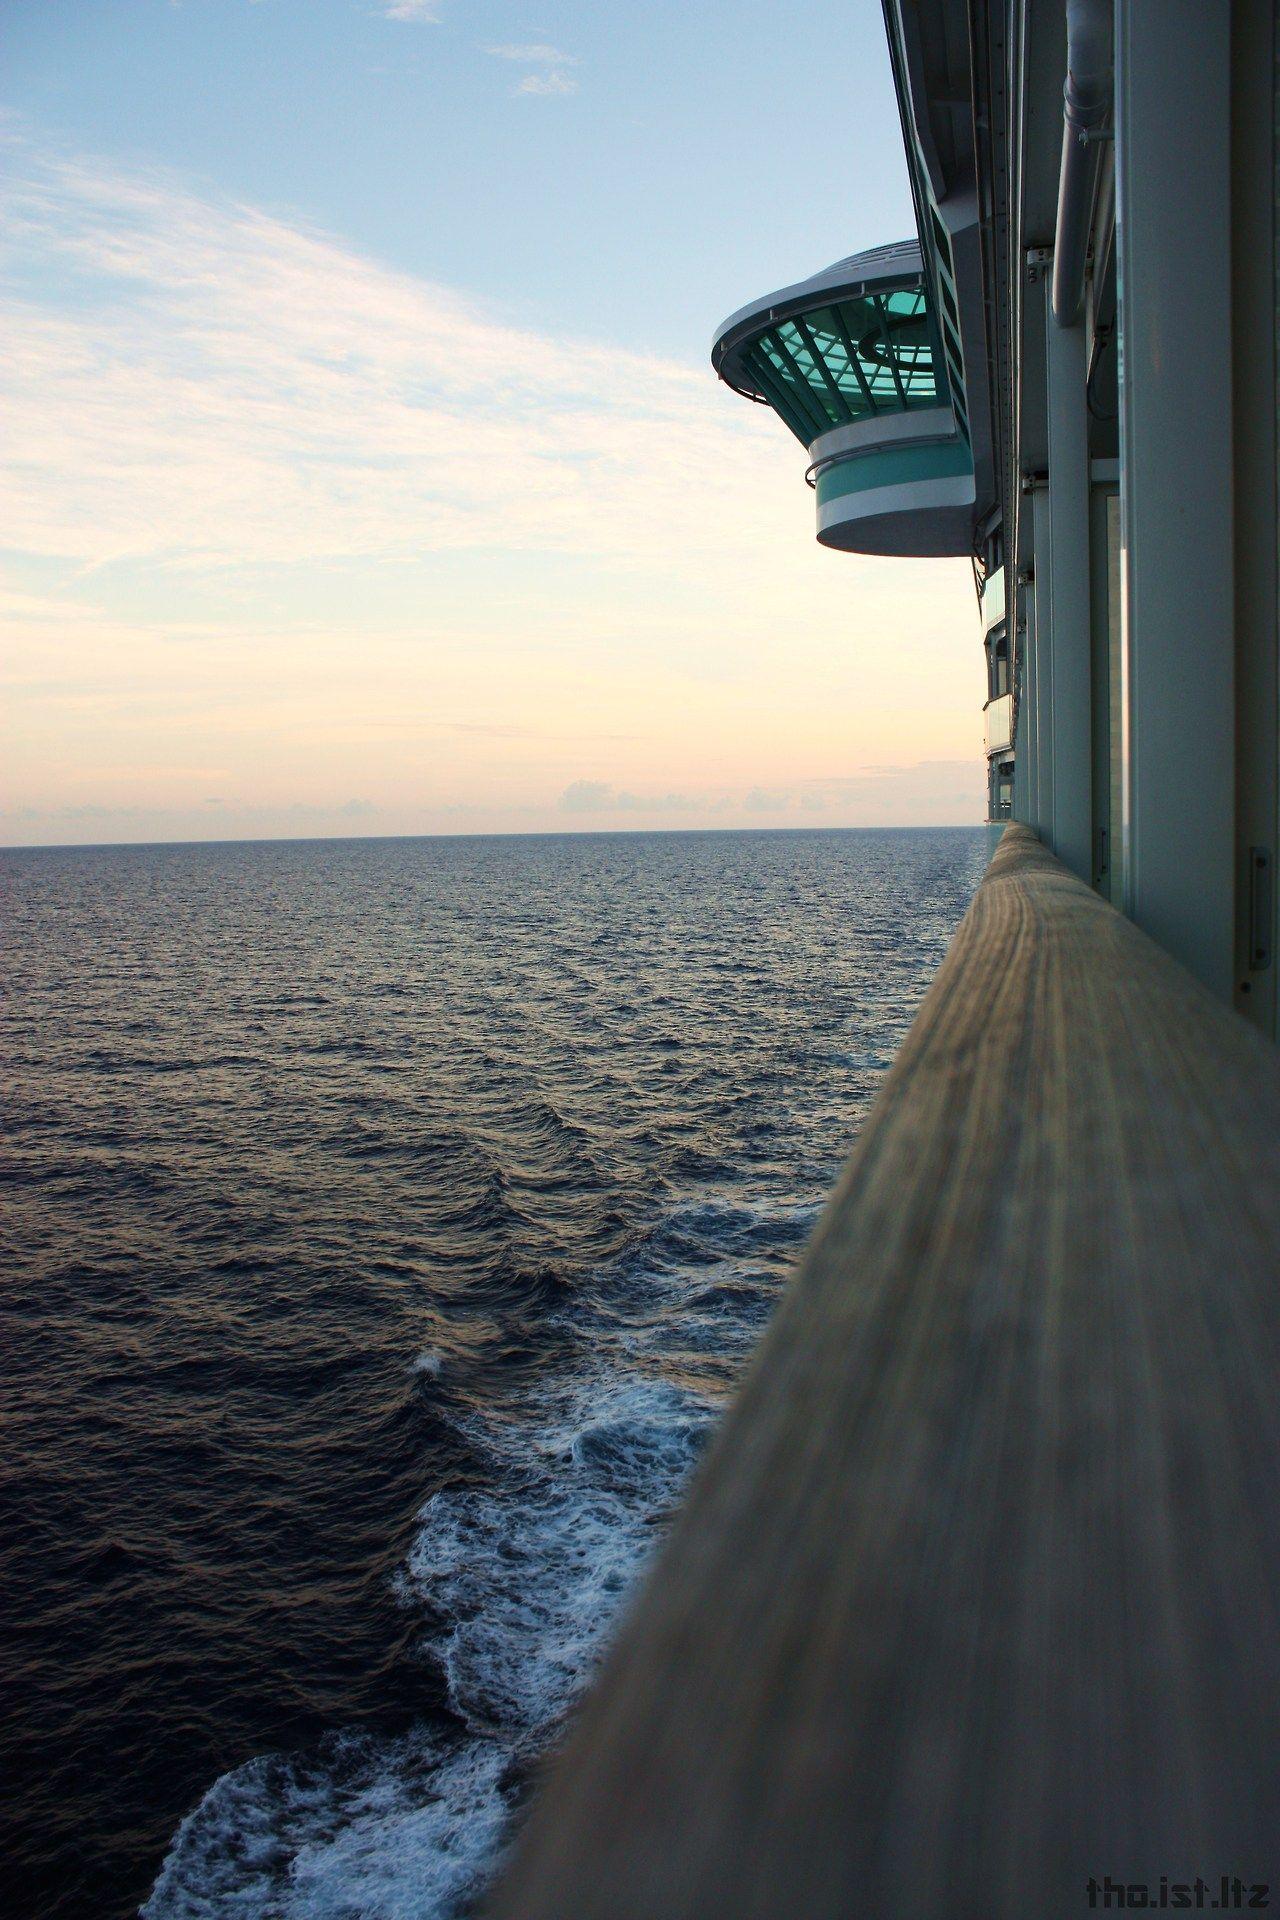 Sunset on Liberty of the Seas.